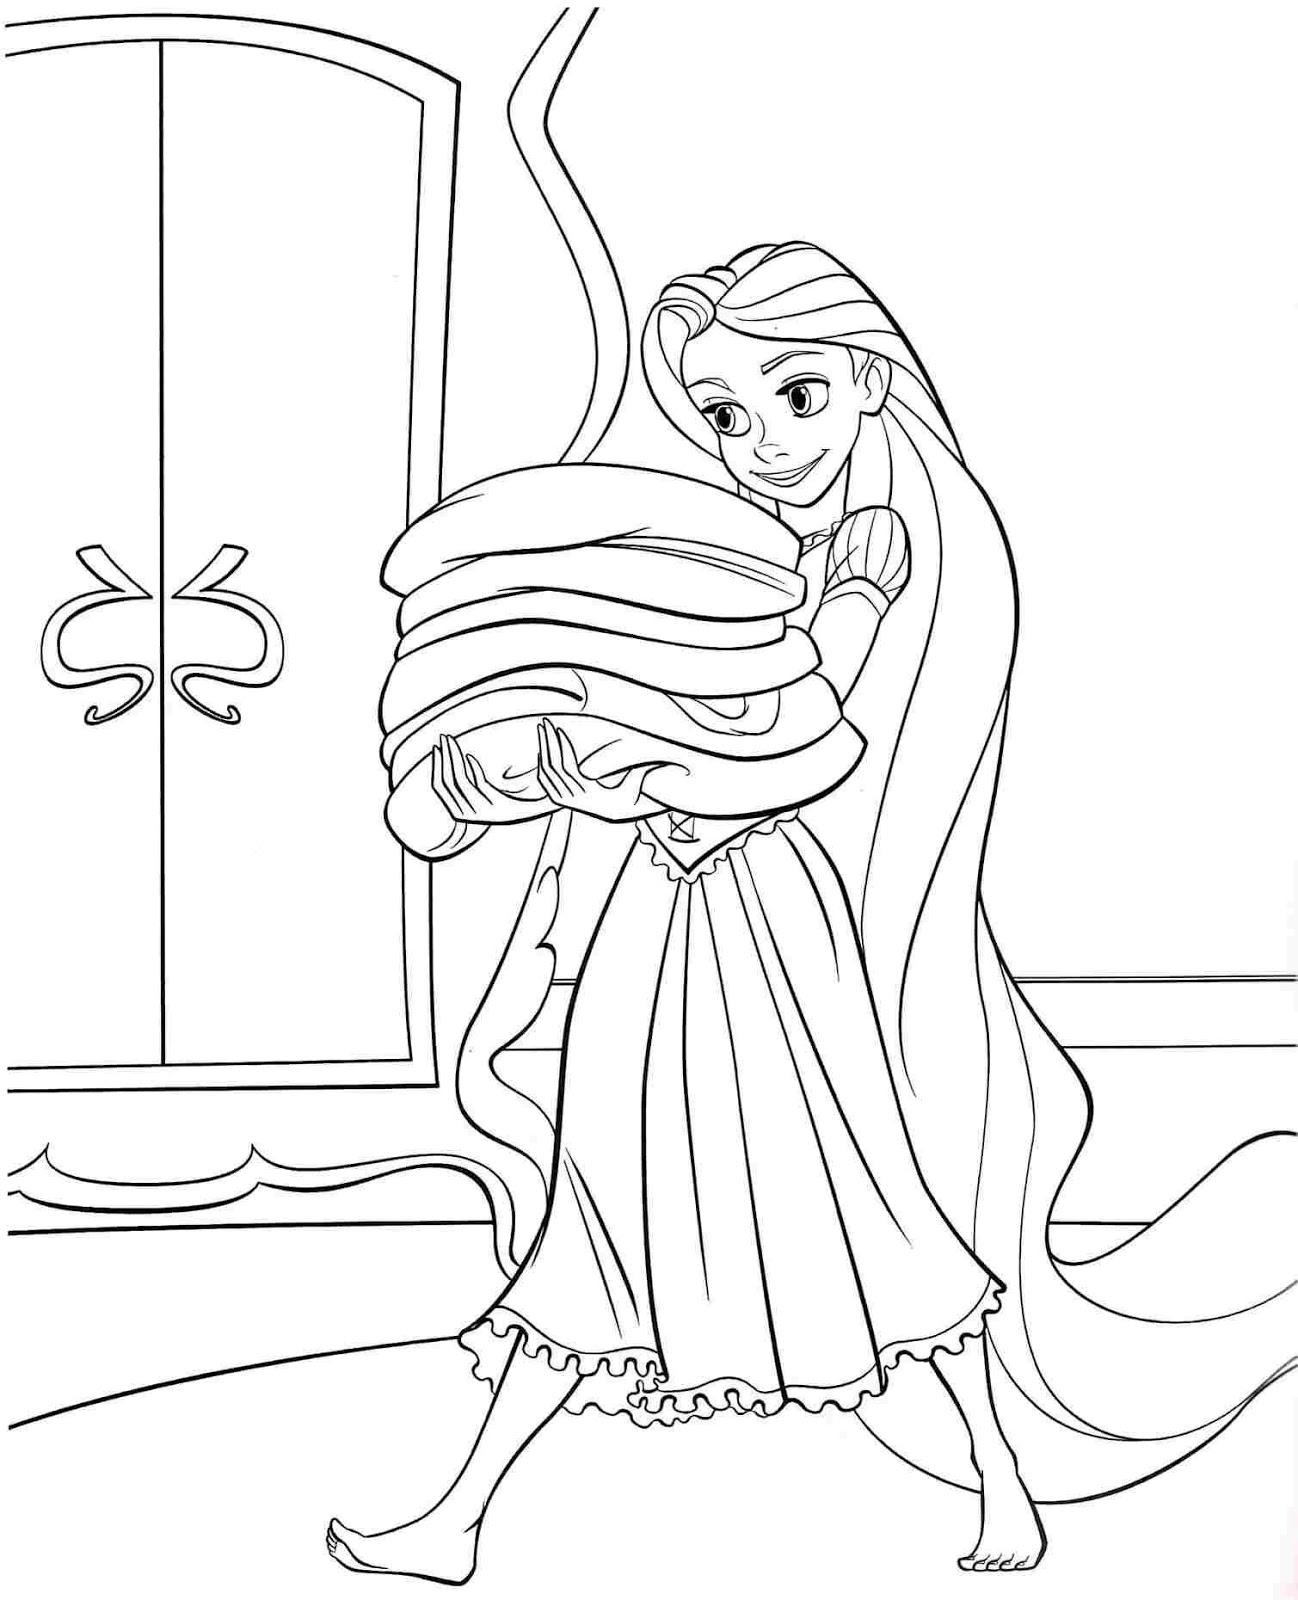 Mewarnai Gambar Putri Rapunzel Suka Mewarnai